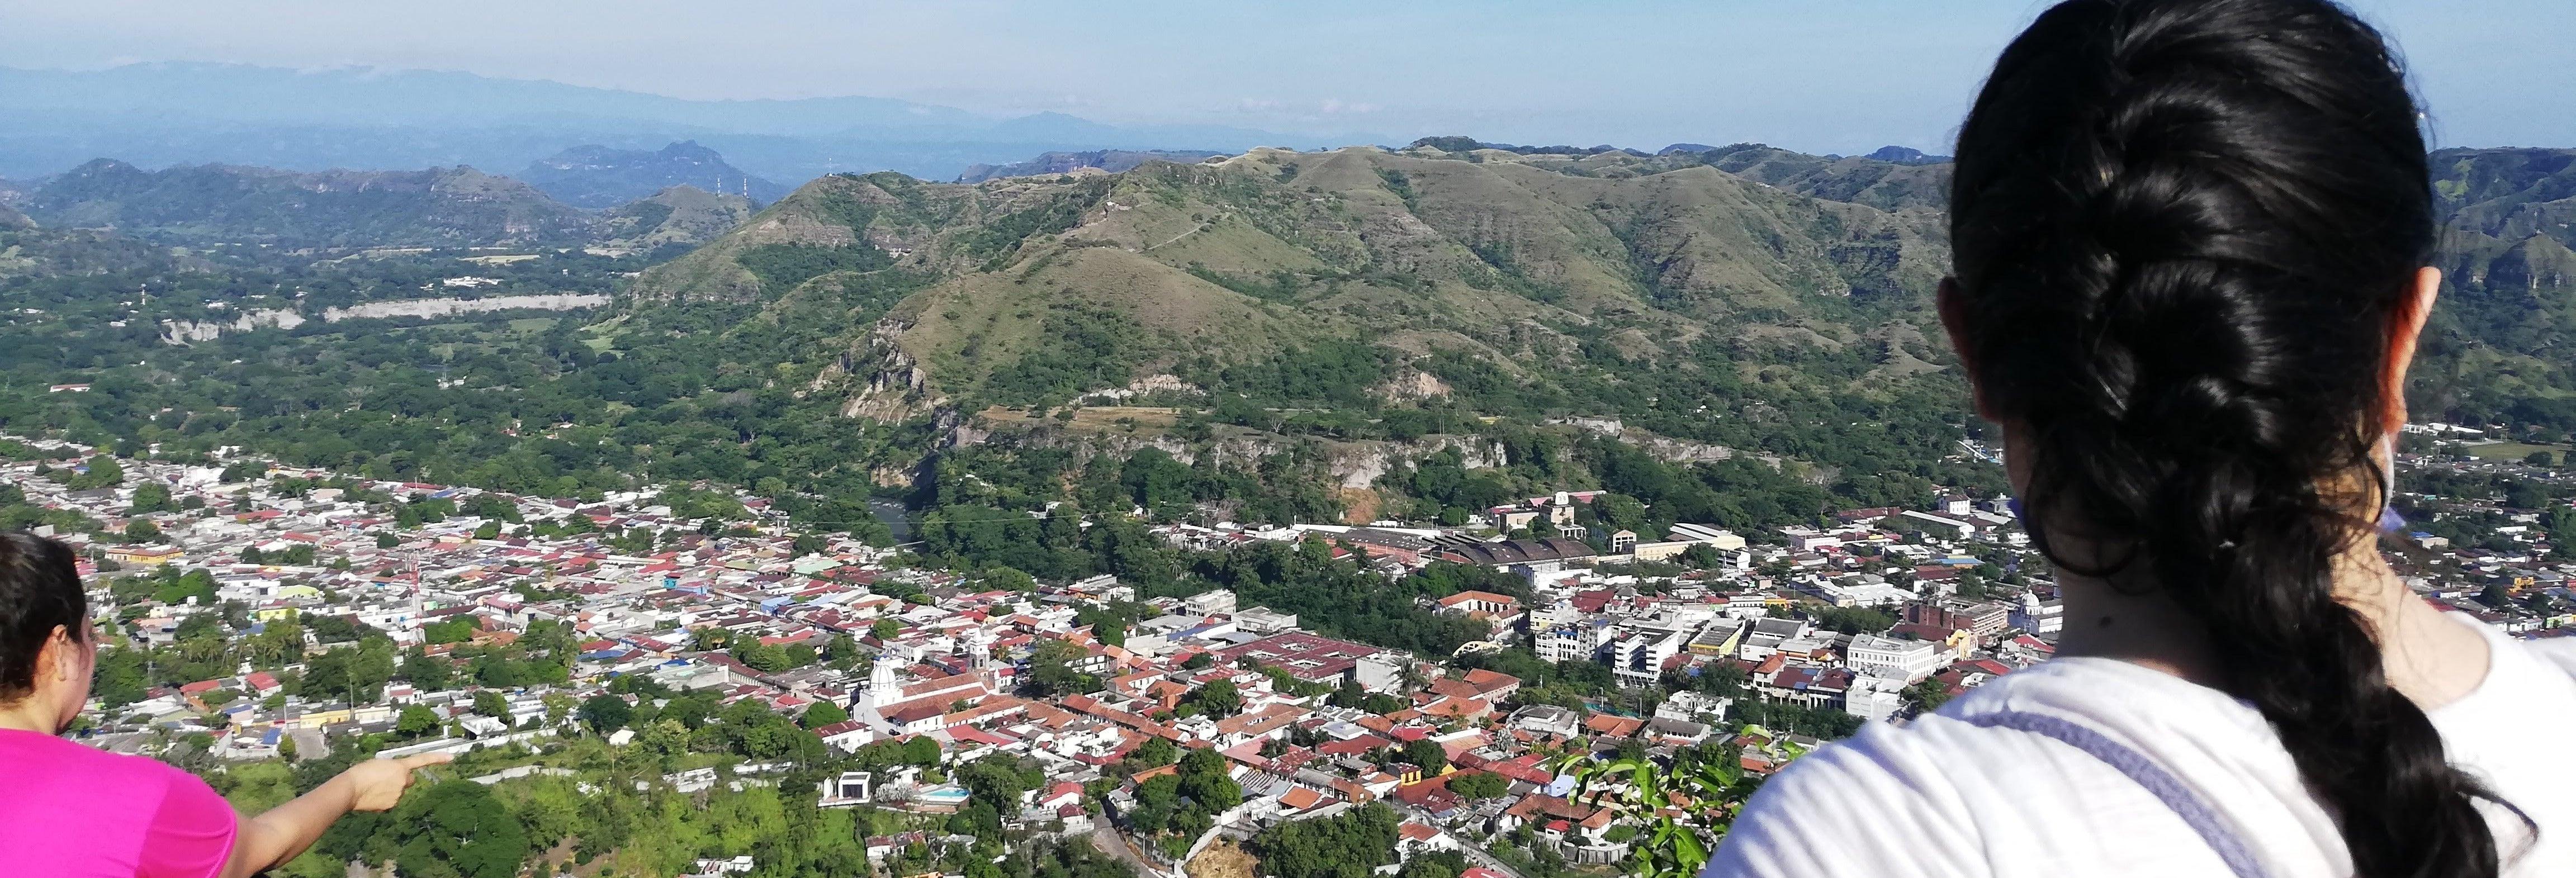 Free tour por el cerro Cacao en Pelota